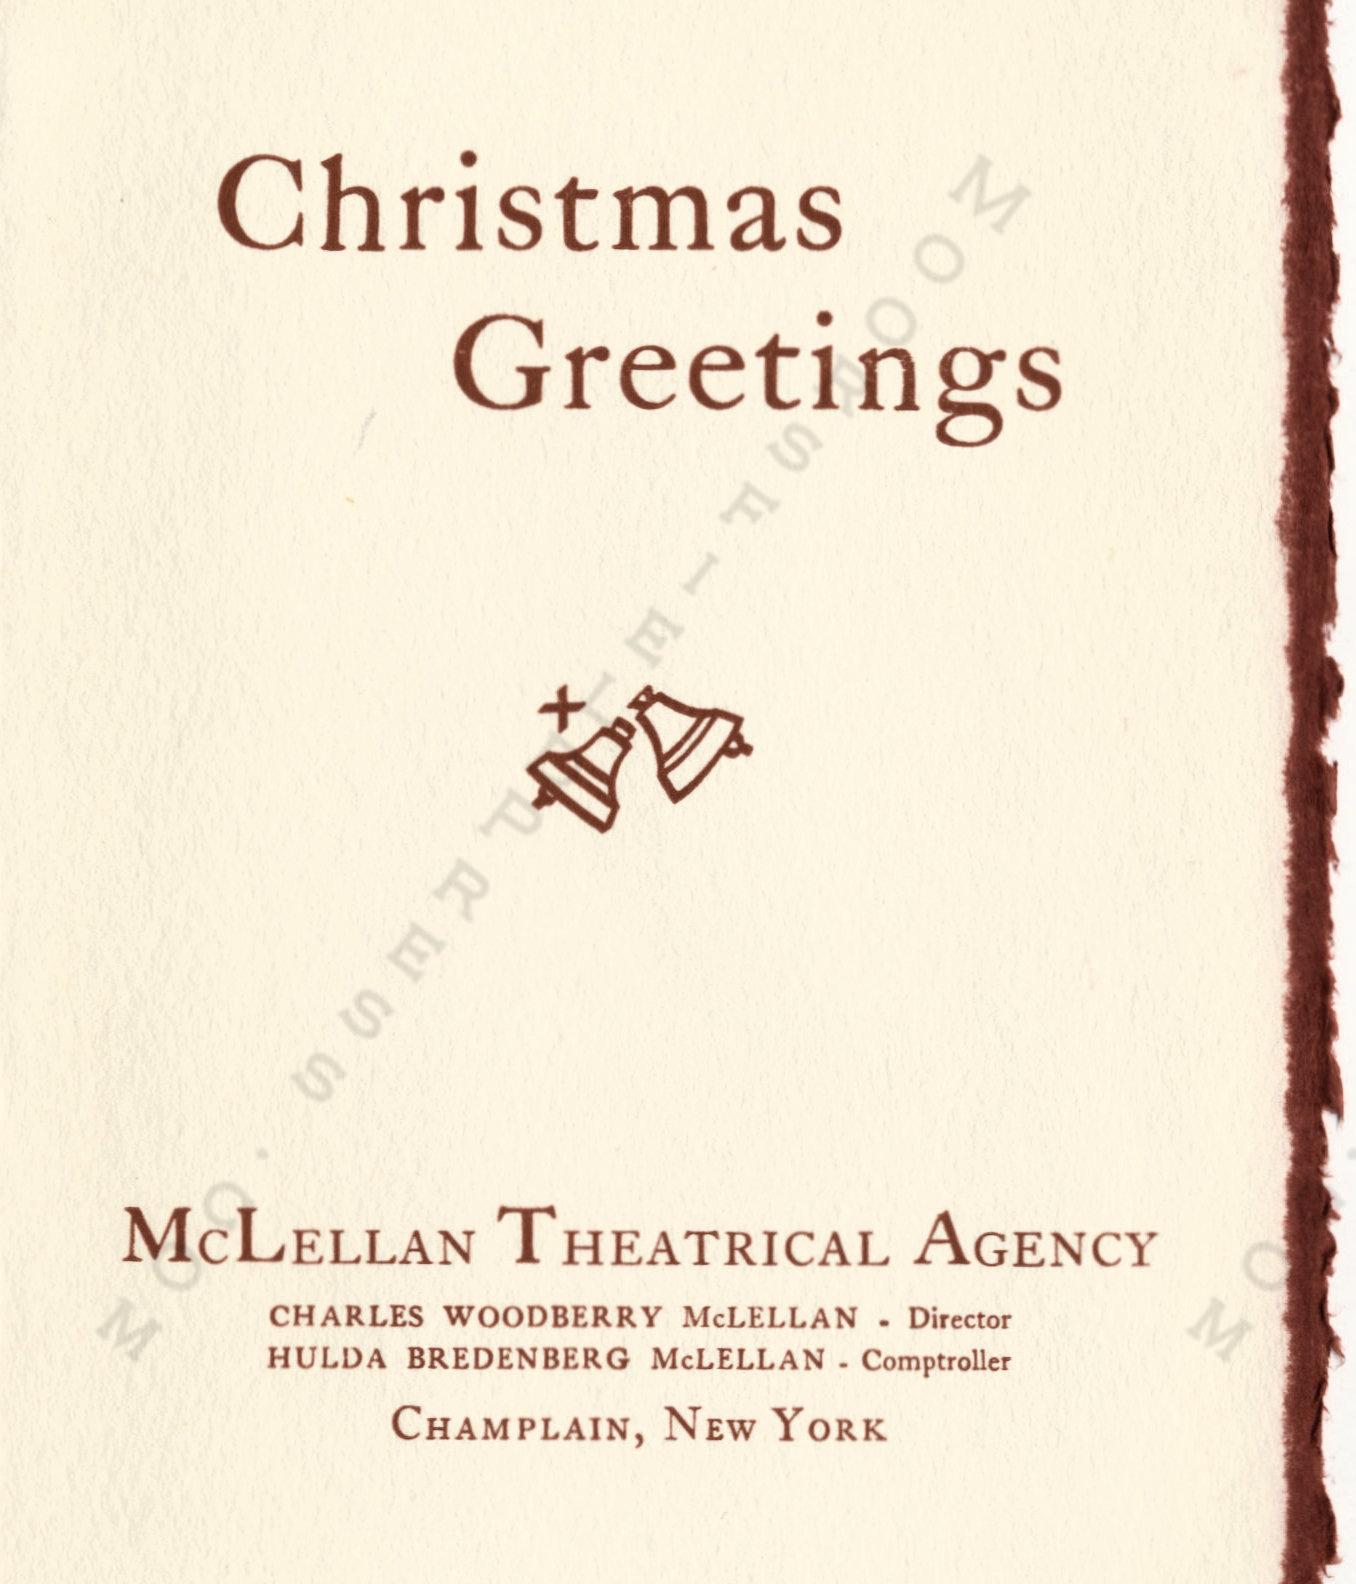 The Mclellan Christmas Cards